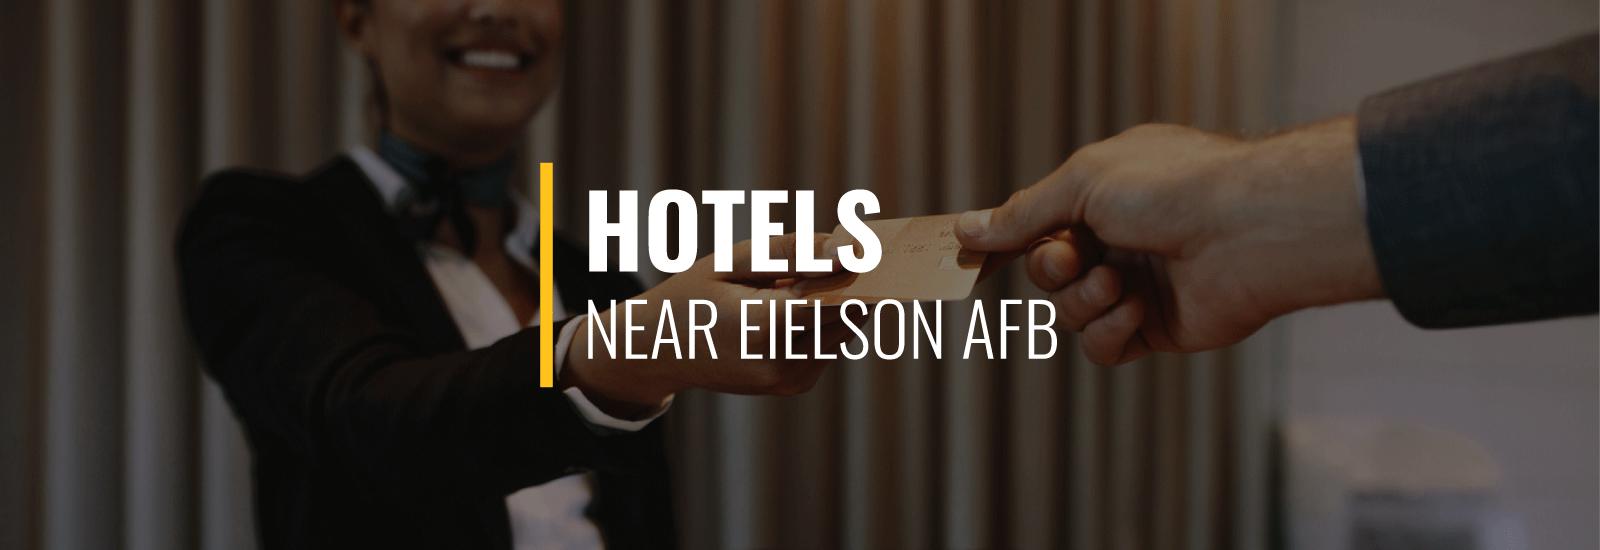 Eielson AFB Hotels